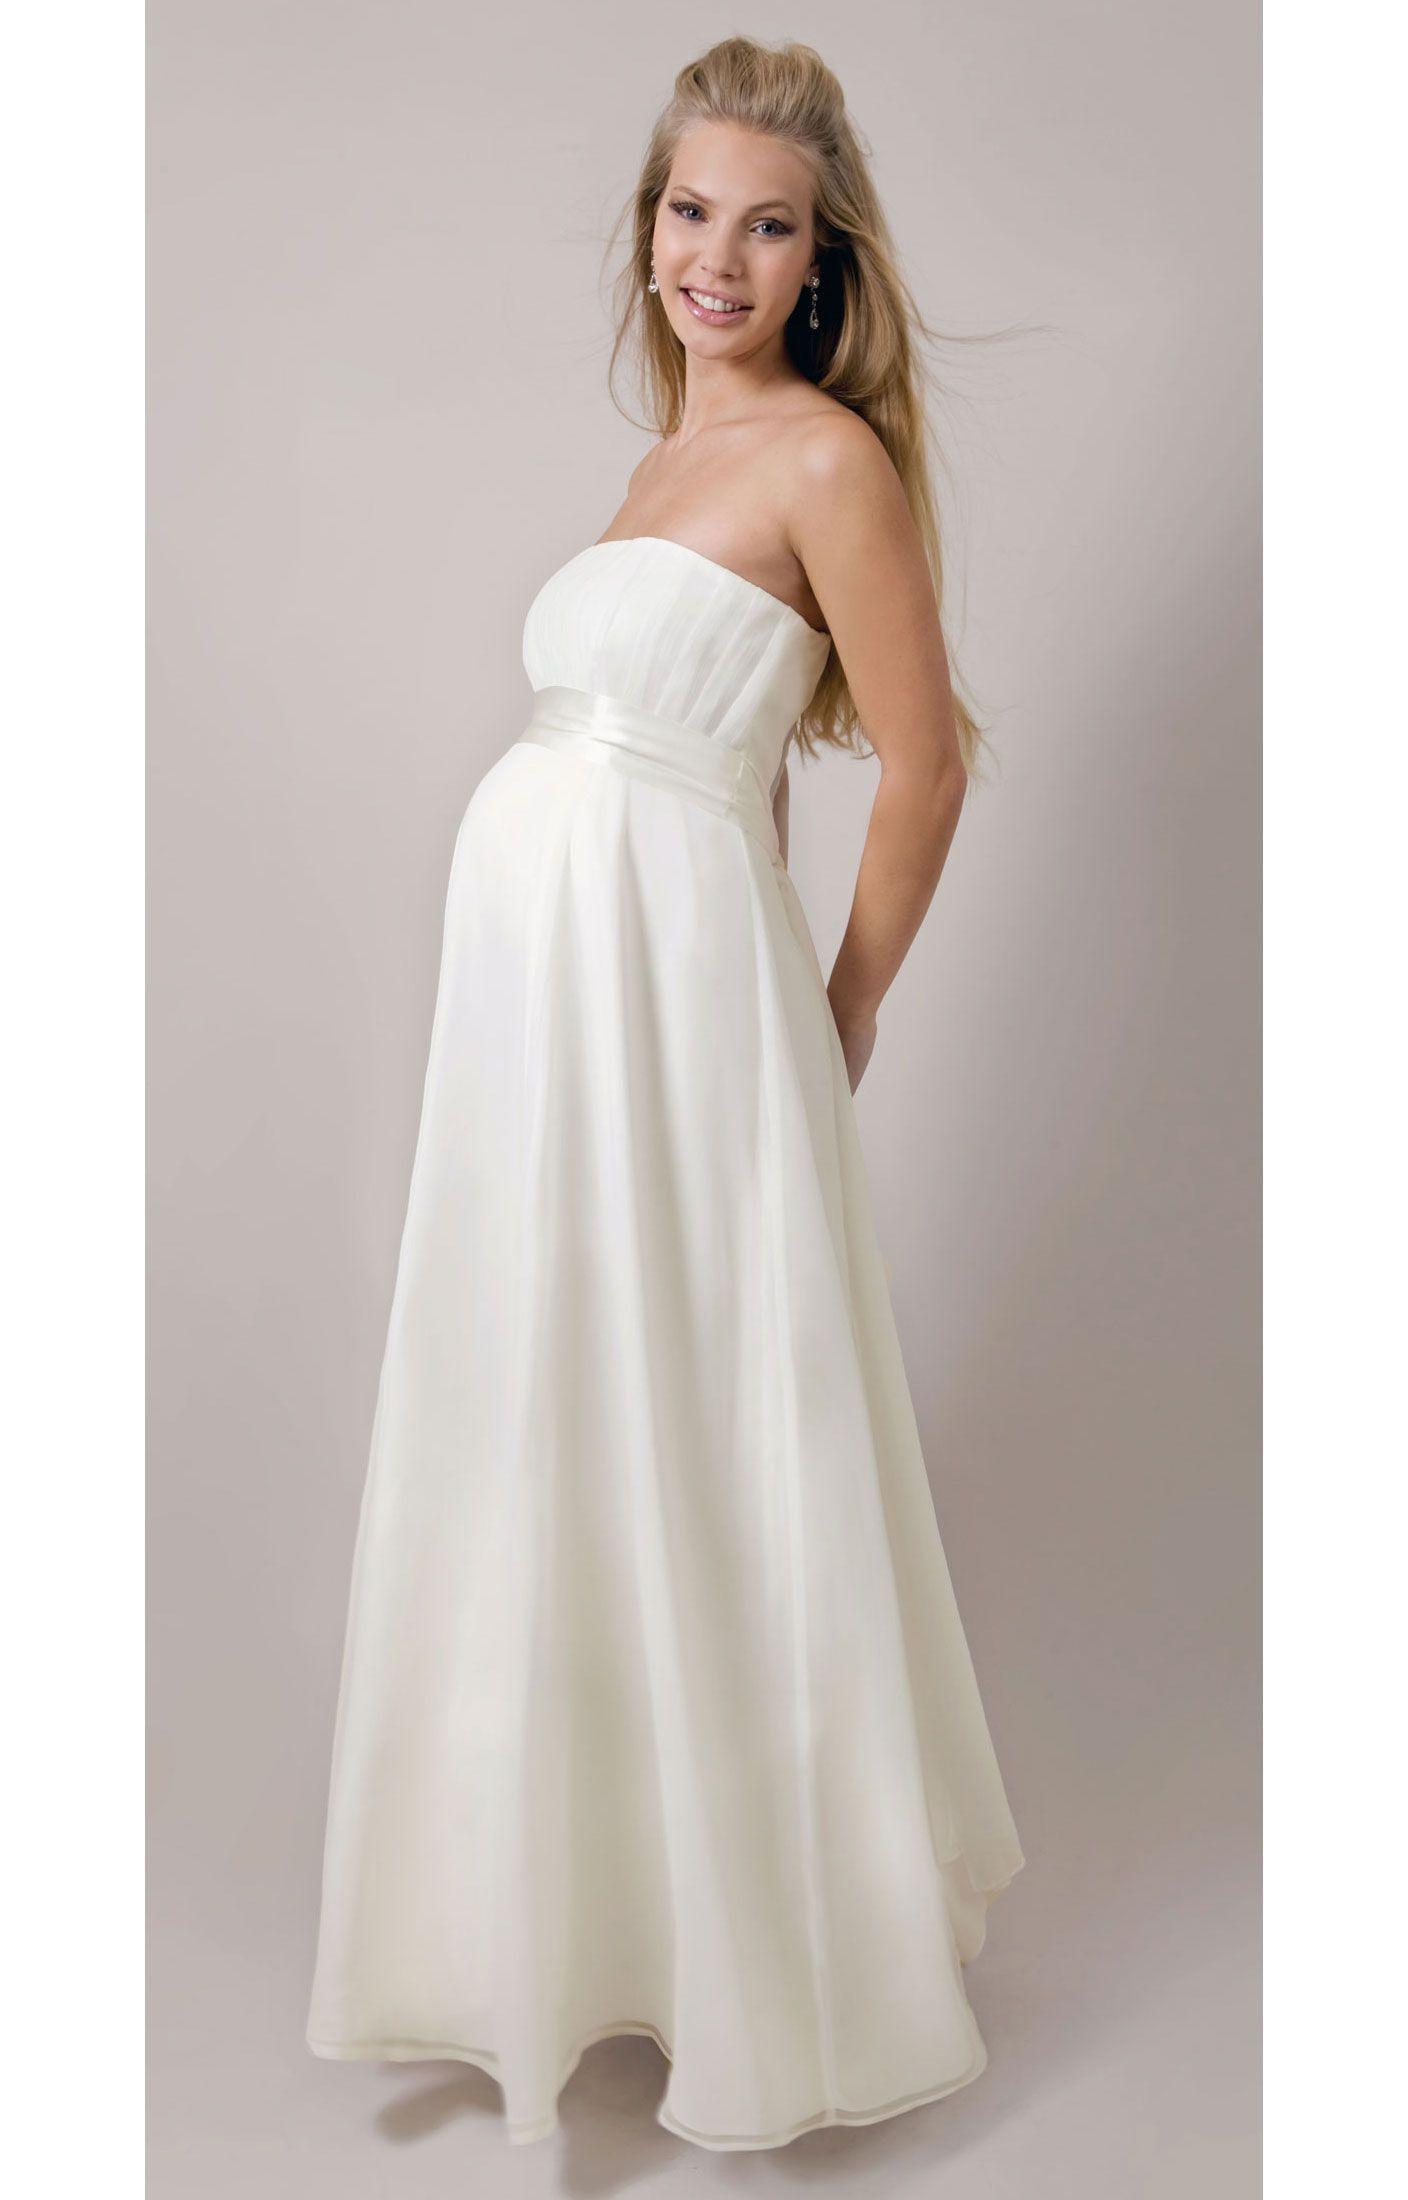 Davids Bridal Cheap Wedding Dresses | Weddingdress | Pinterest ...